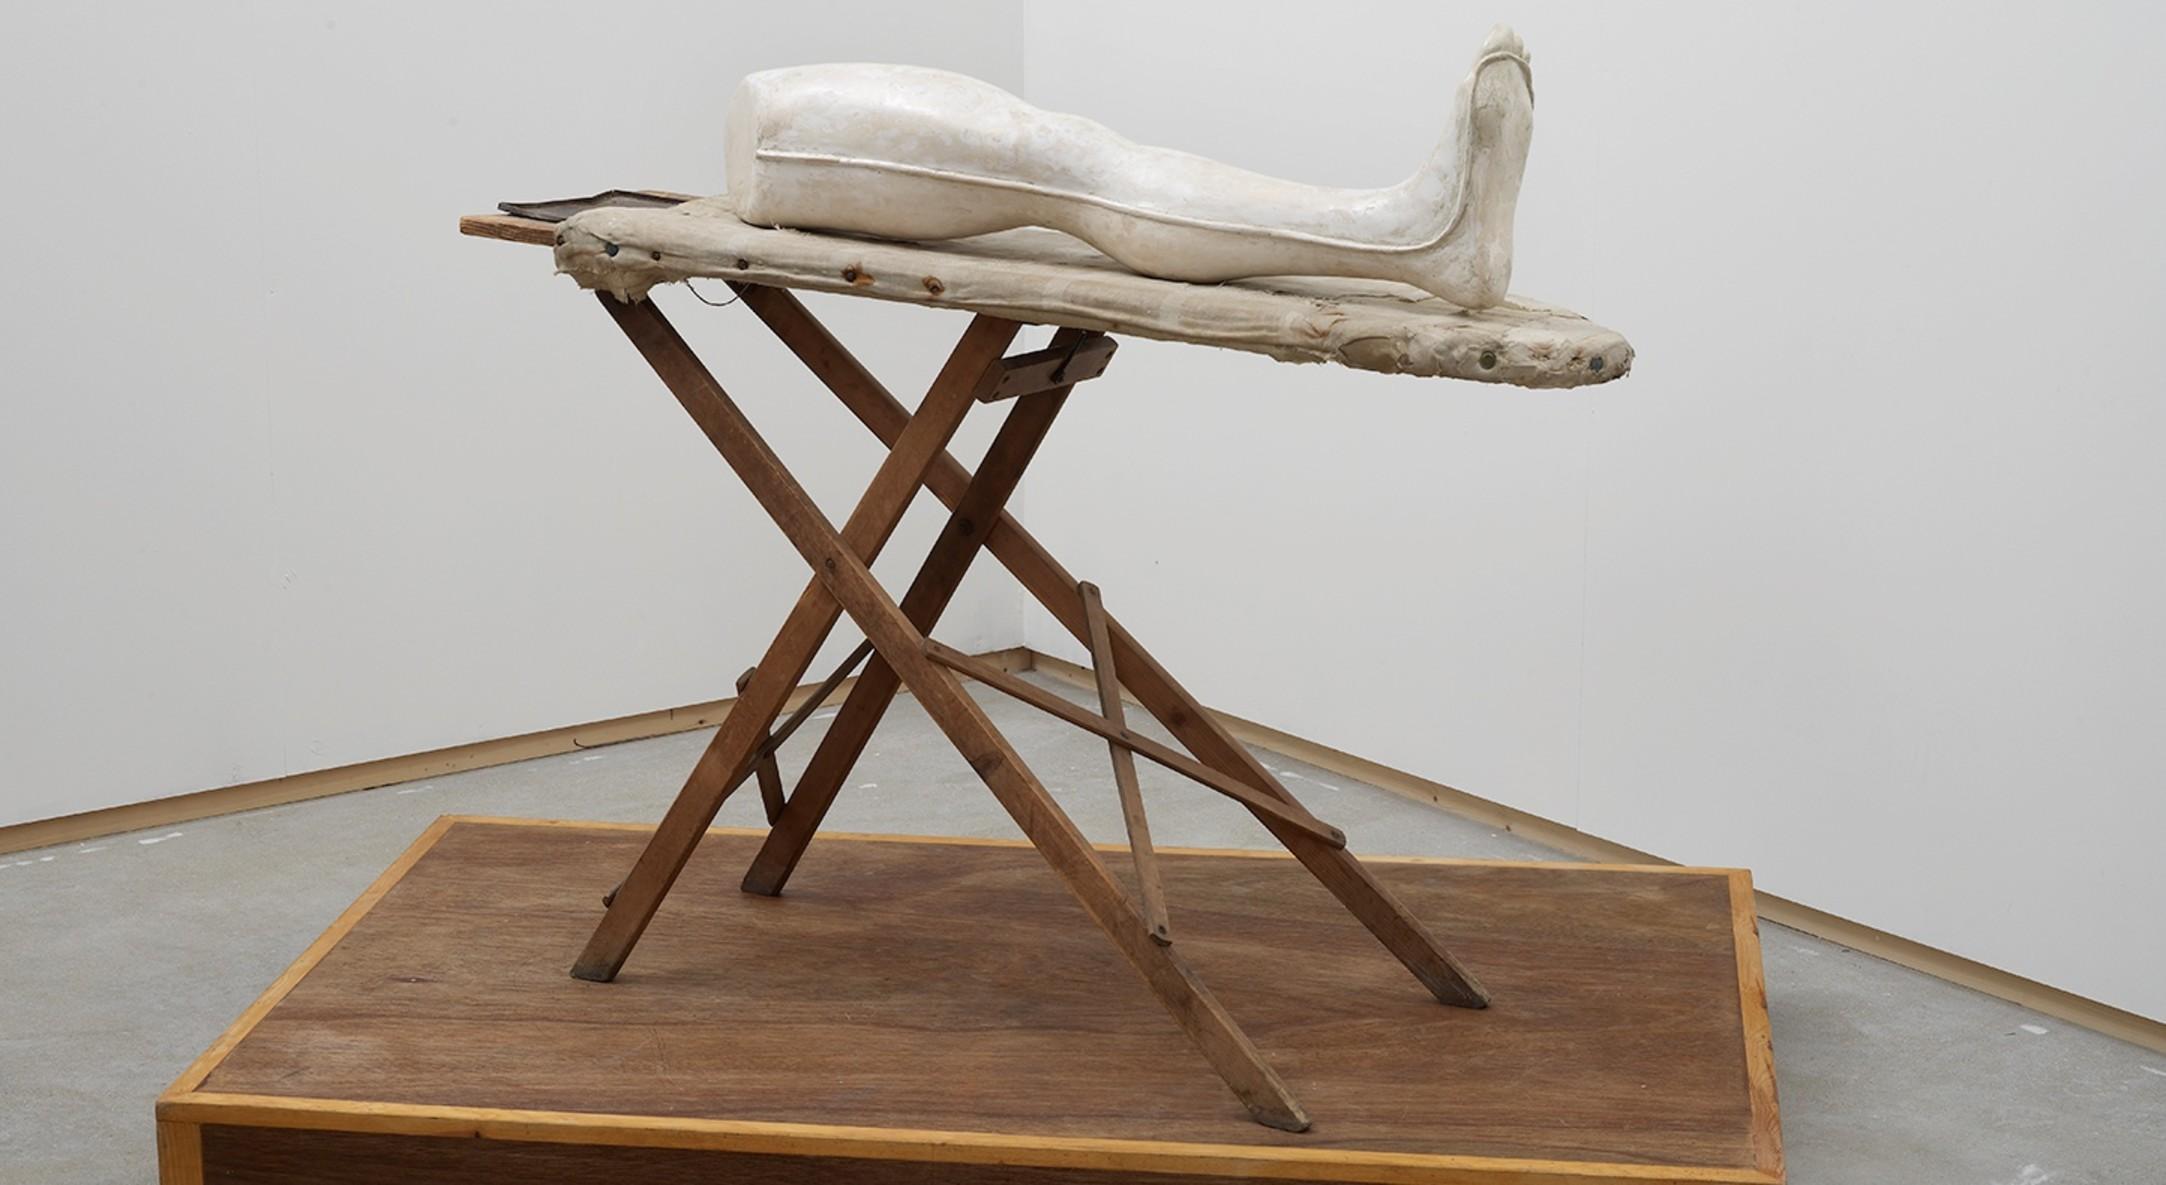 Stuart Brisley, Louise Bourgeois' Leg, 2002, Performance object, Plaster, ironing board, wood, 119 x 154 x 98 cm, 46 7/8 x 60 5/8 x 38 5/8 in